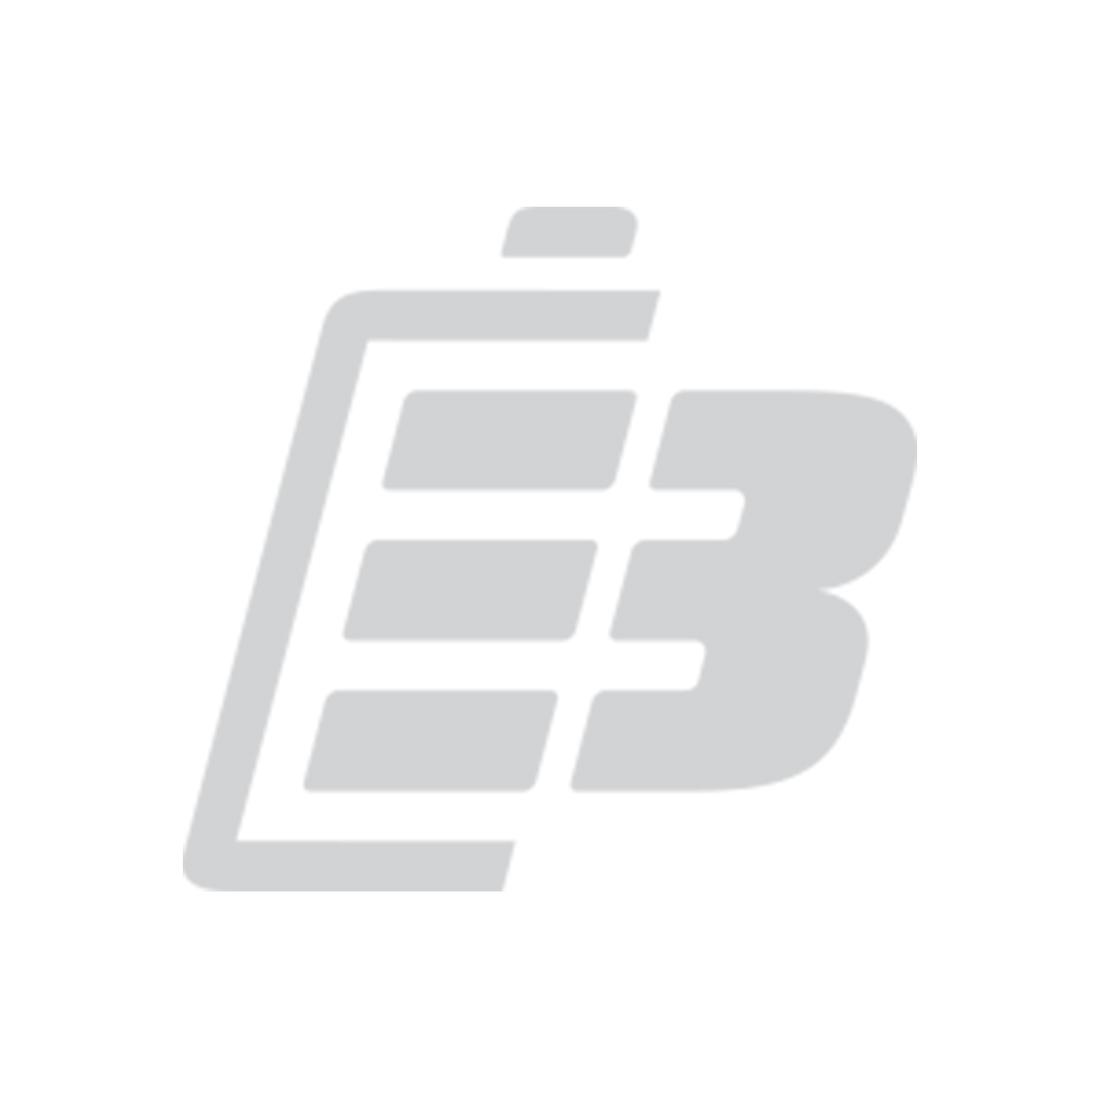 Barcode scanner battery Symbol MC3000_1